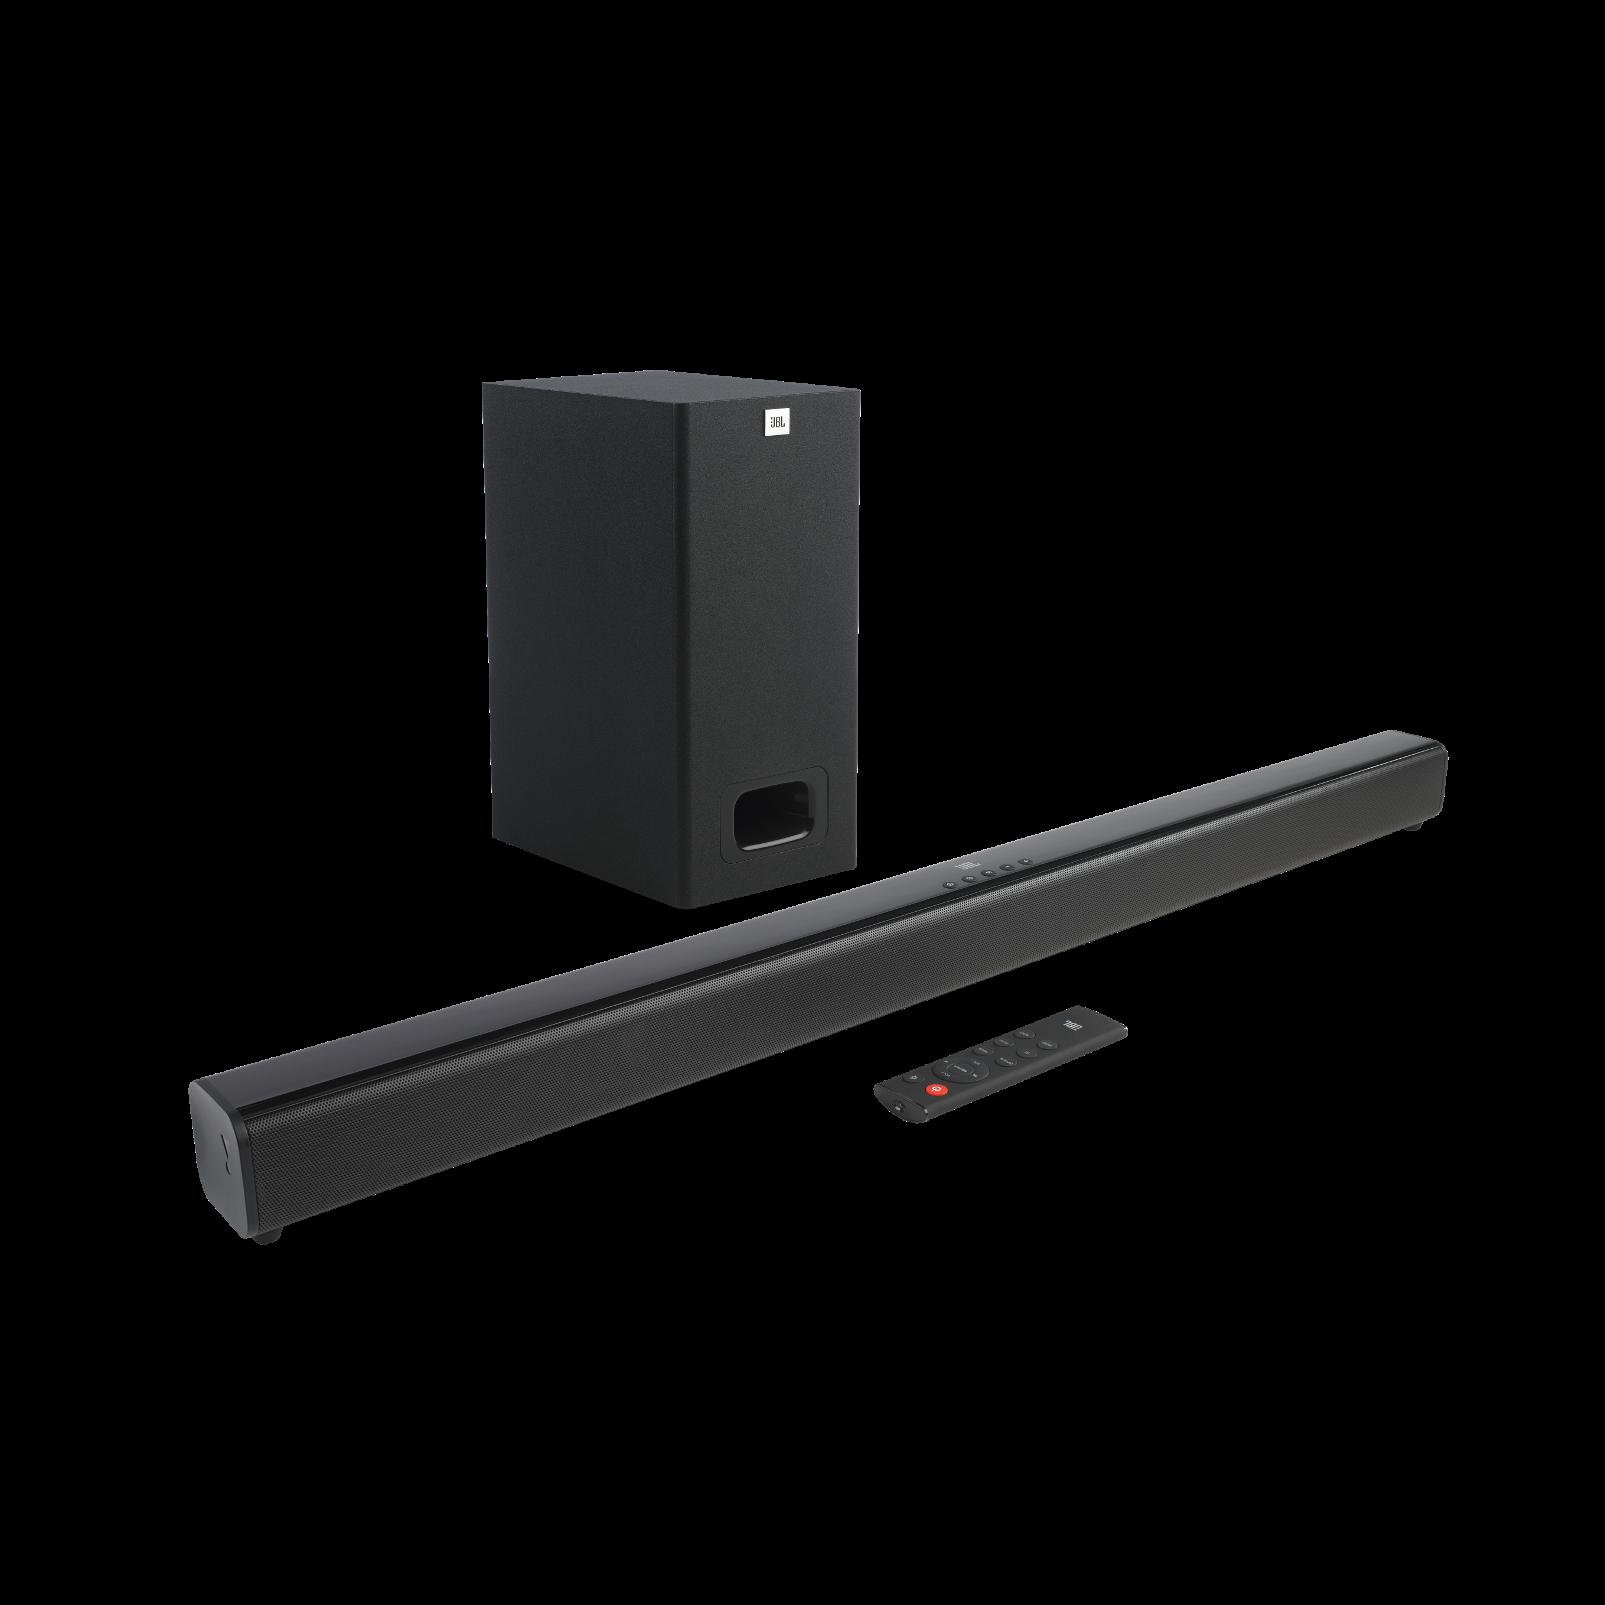 JBL Cinema SB230 - Black - 2.1 Channel Soundbar with Wired Subwoofer - Hero